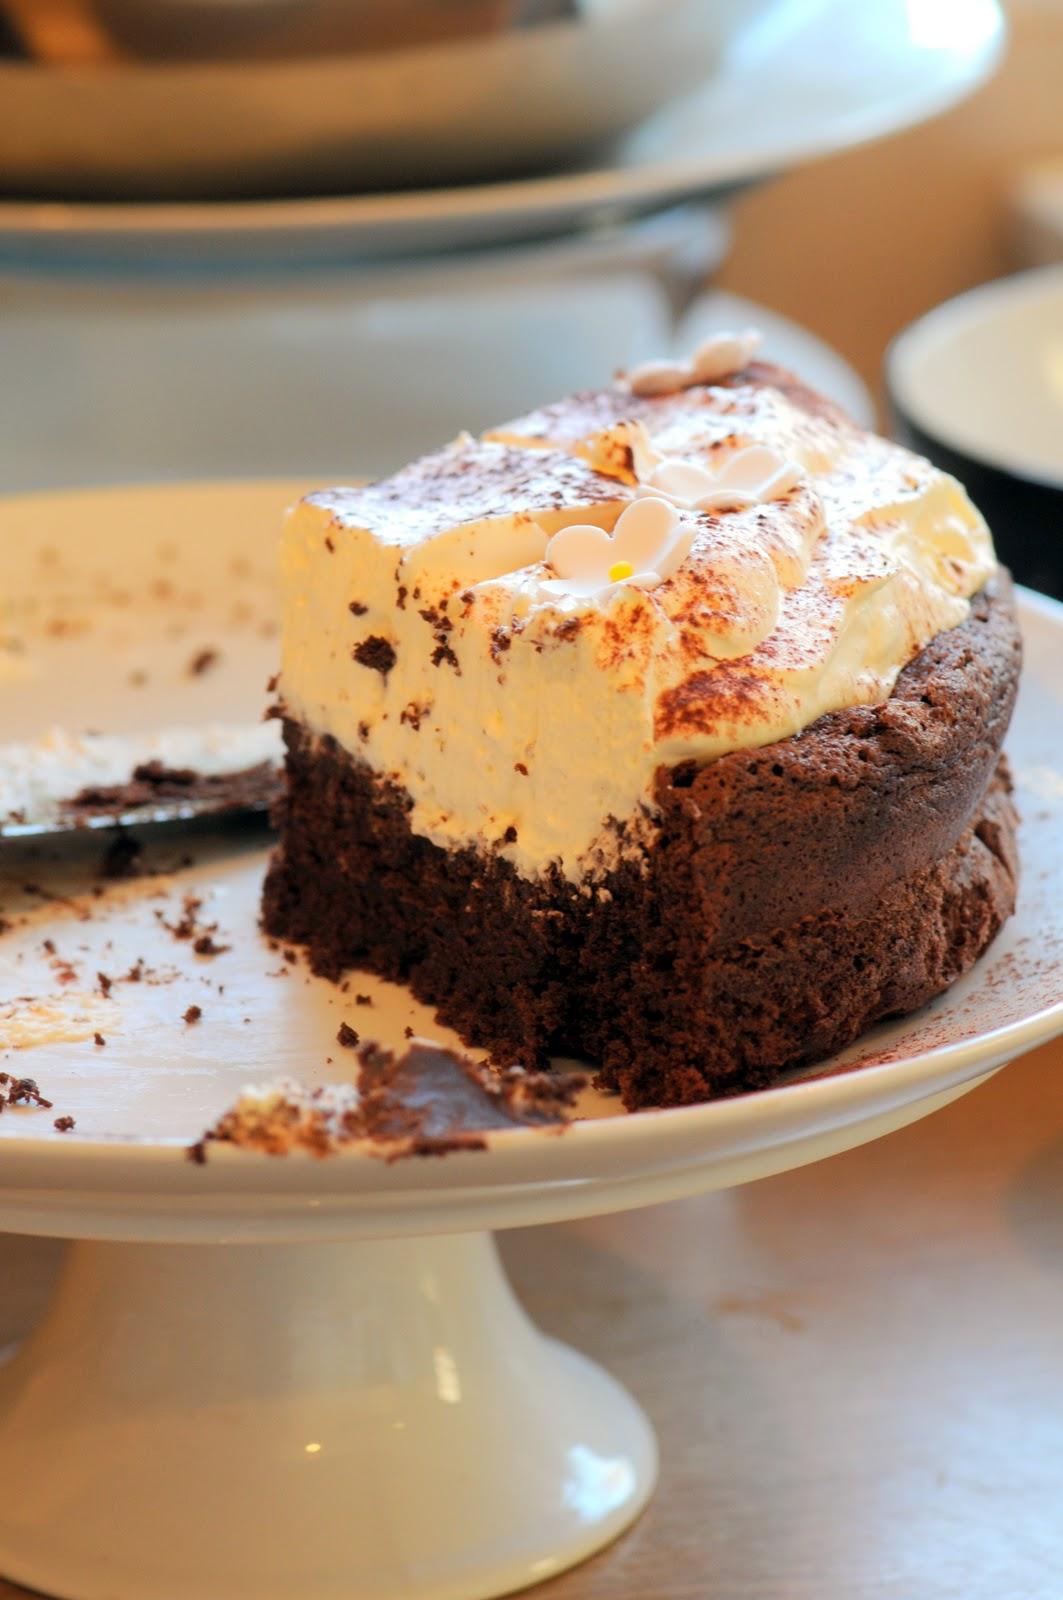 Nigellas Chocolate Cloud Cake Ren Behan Author Wild Honey and Rye